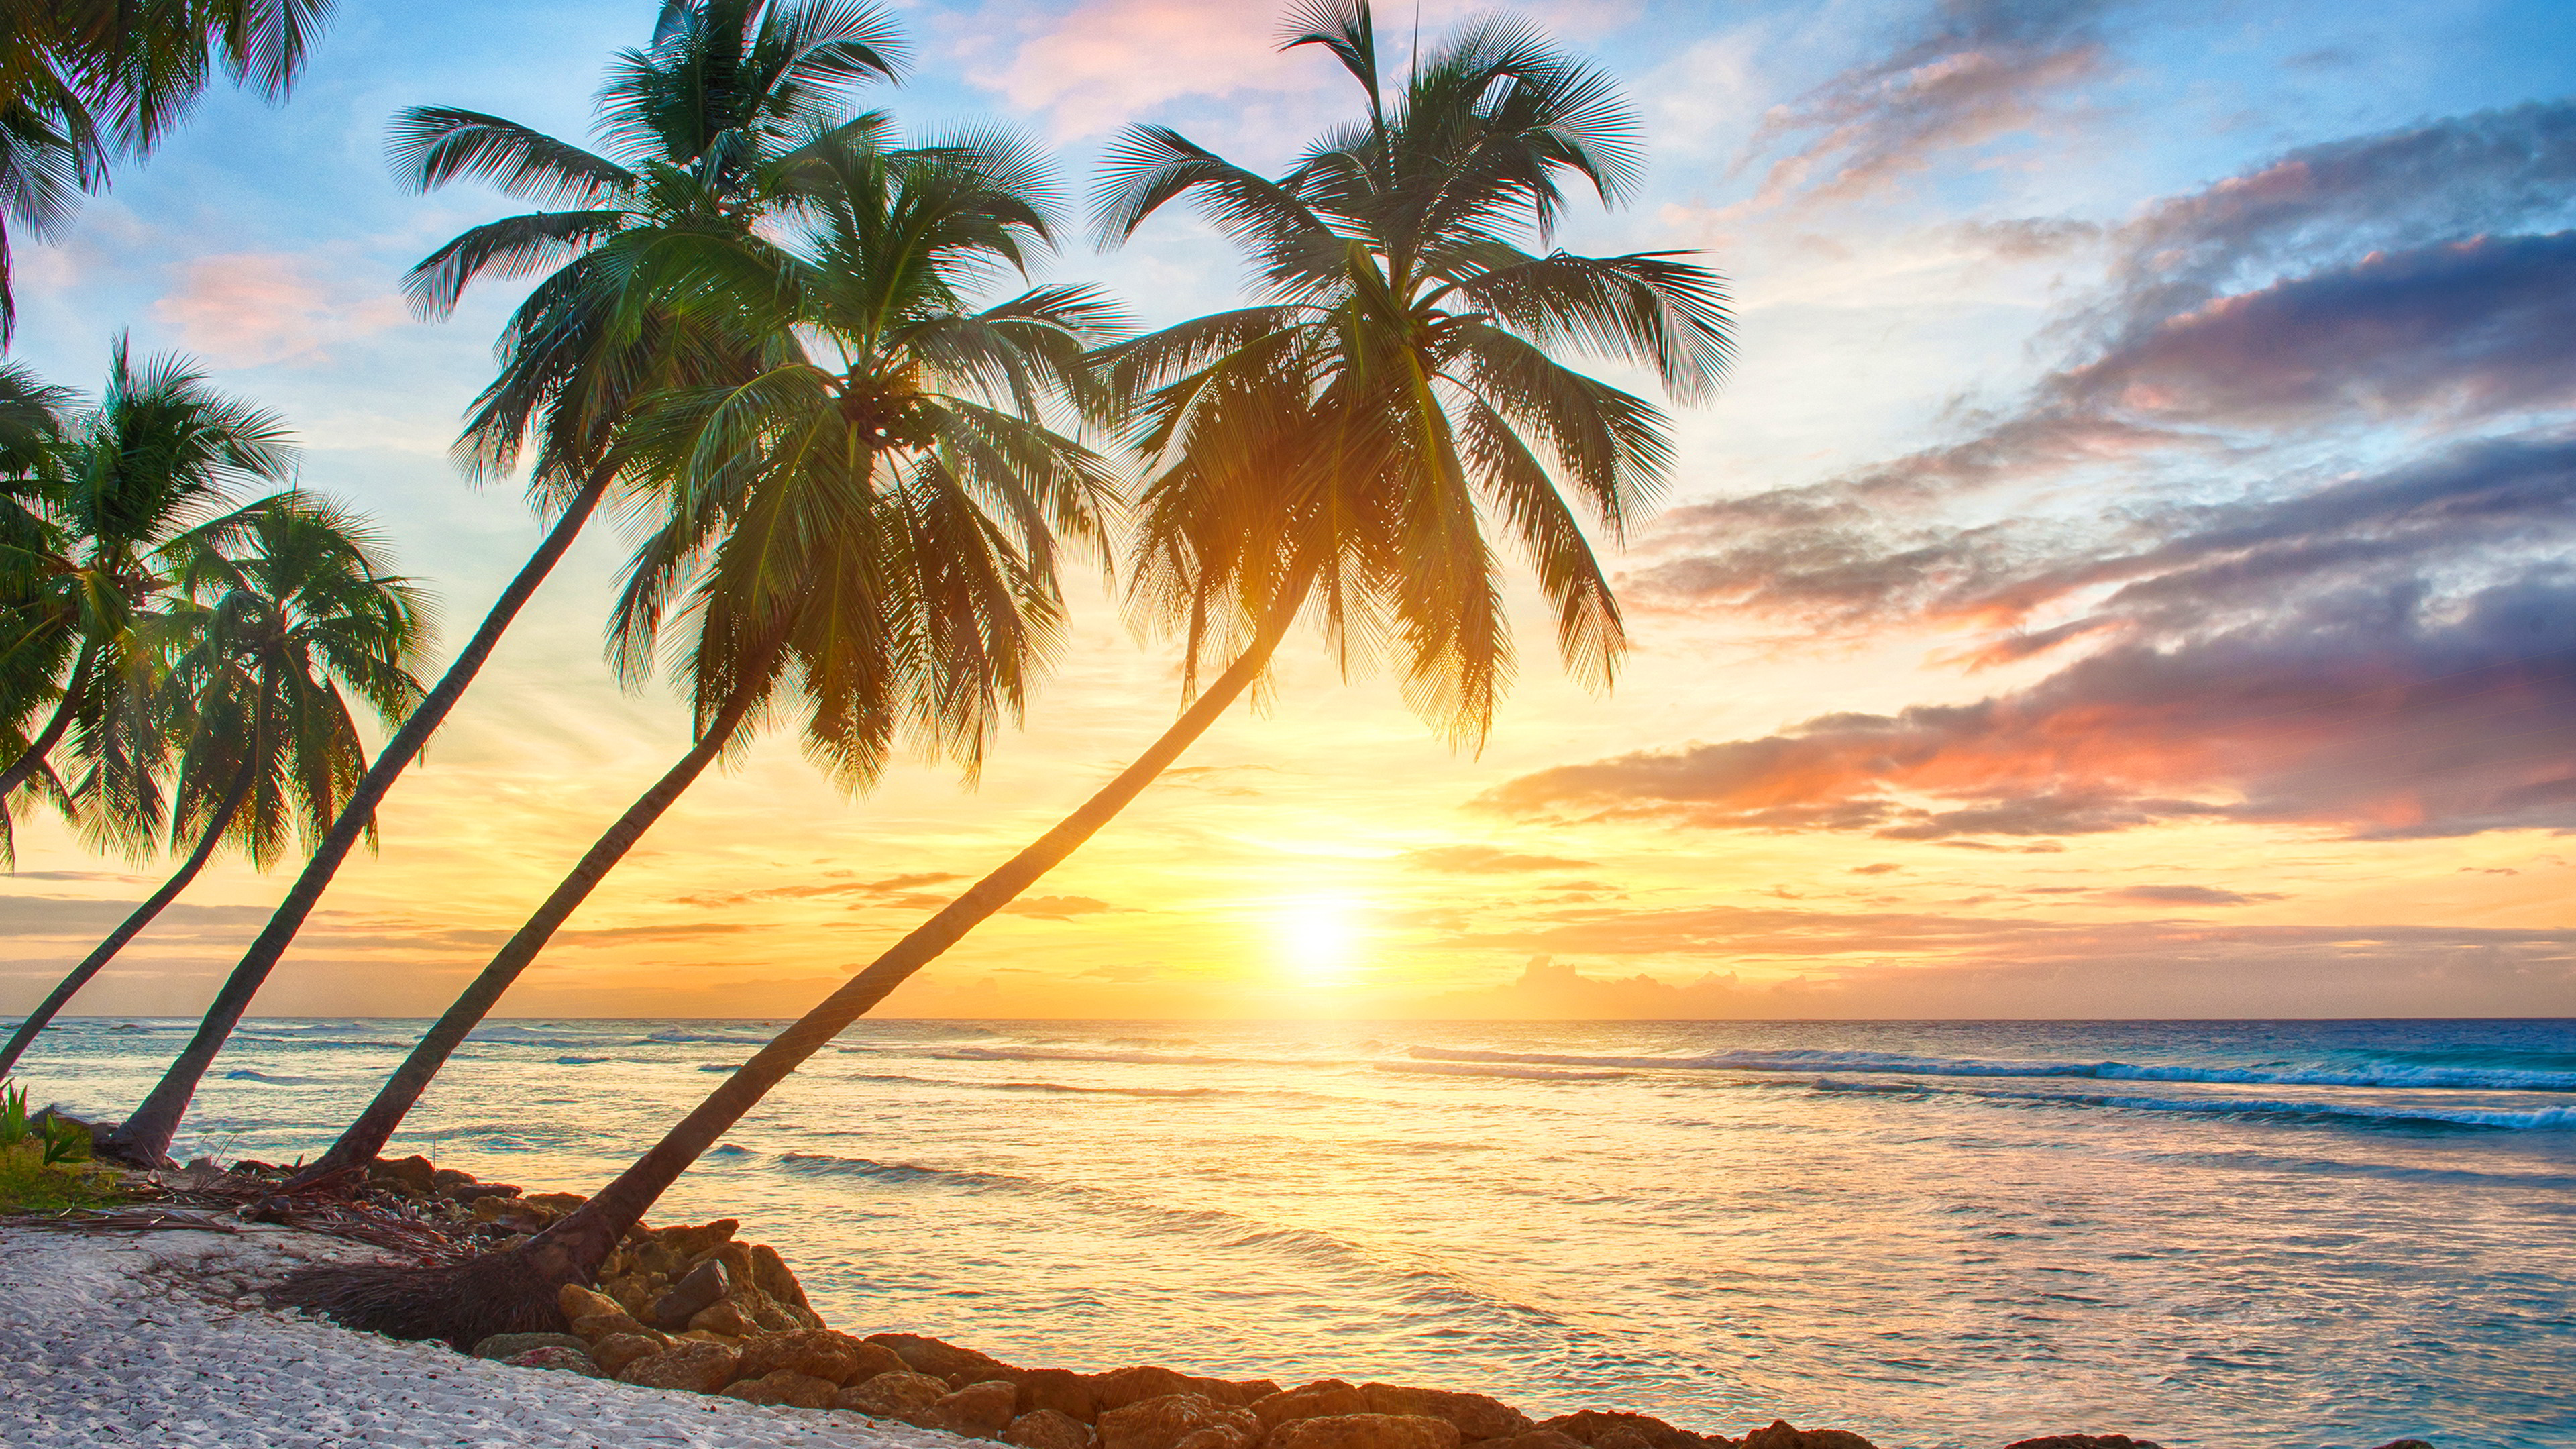 Tropical Background 3840x2160 - Full HD Wall